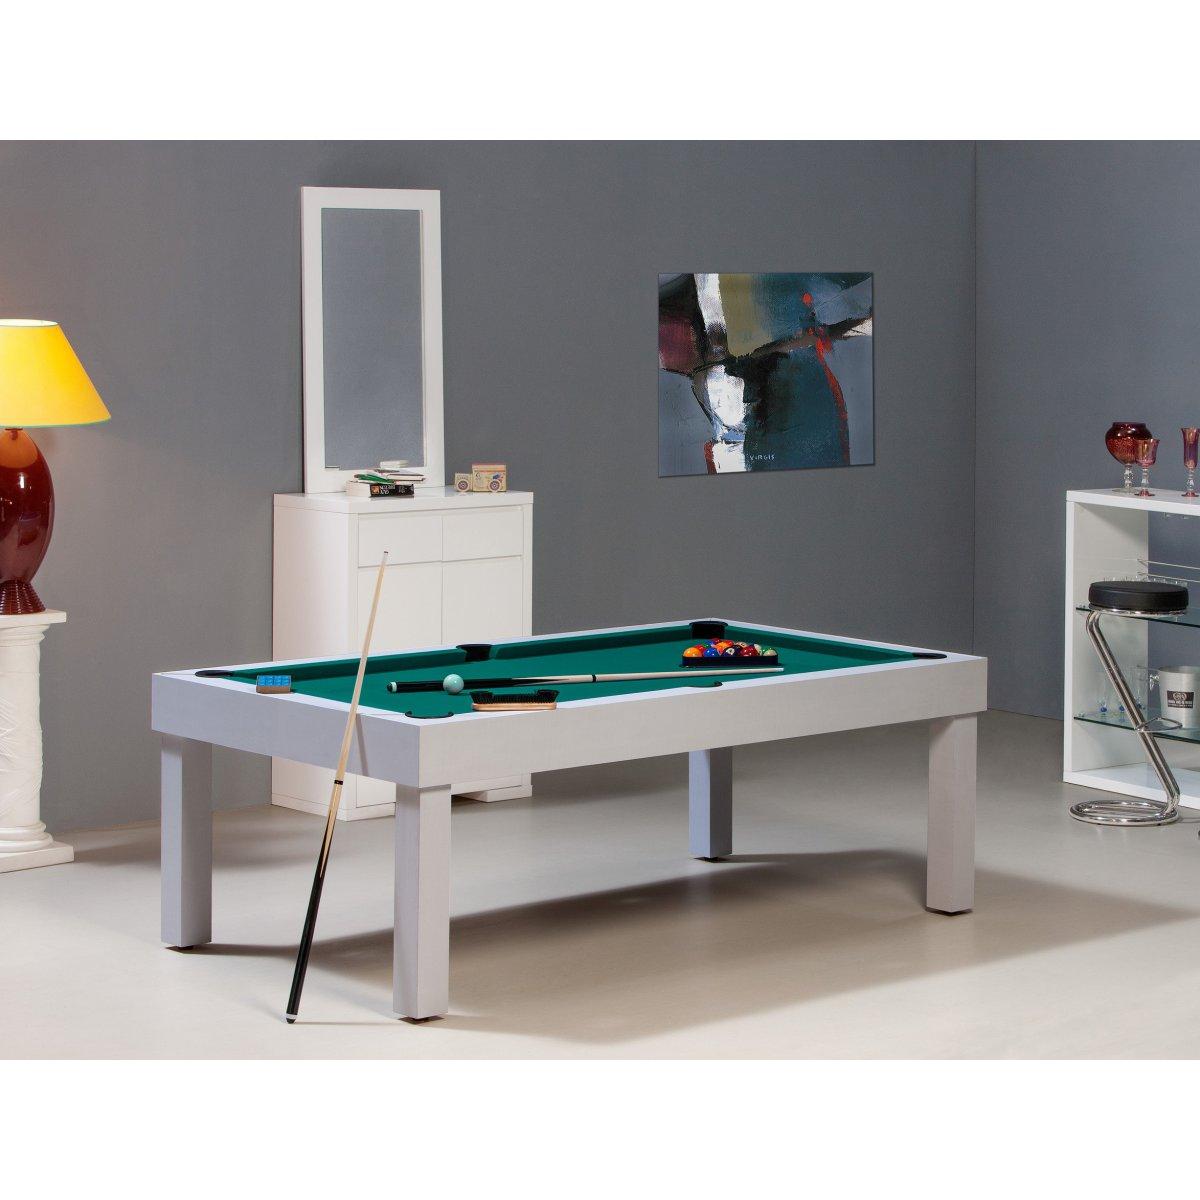 billard pas cher. Black Bedroom Furniture Sets. Home Design Ideas